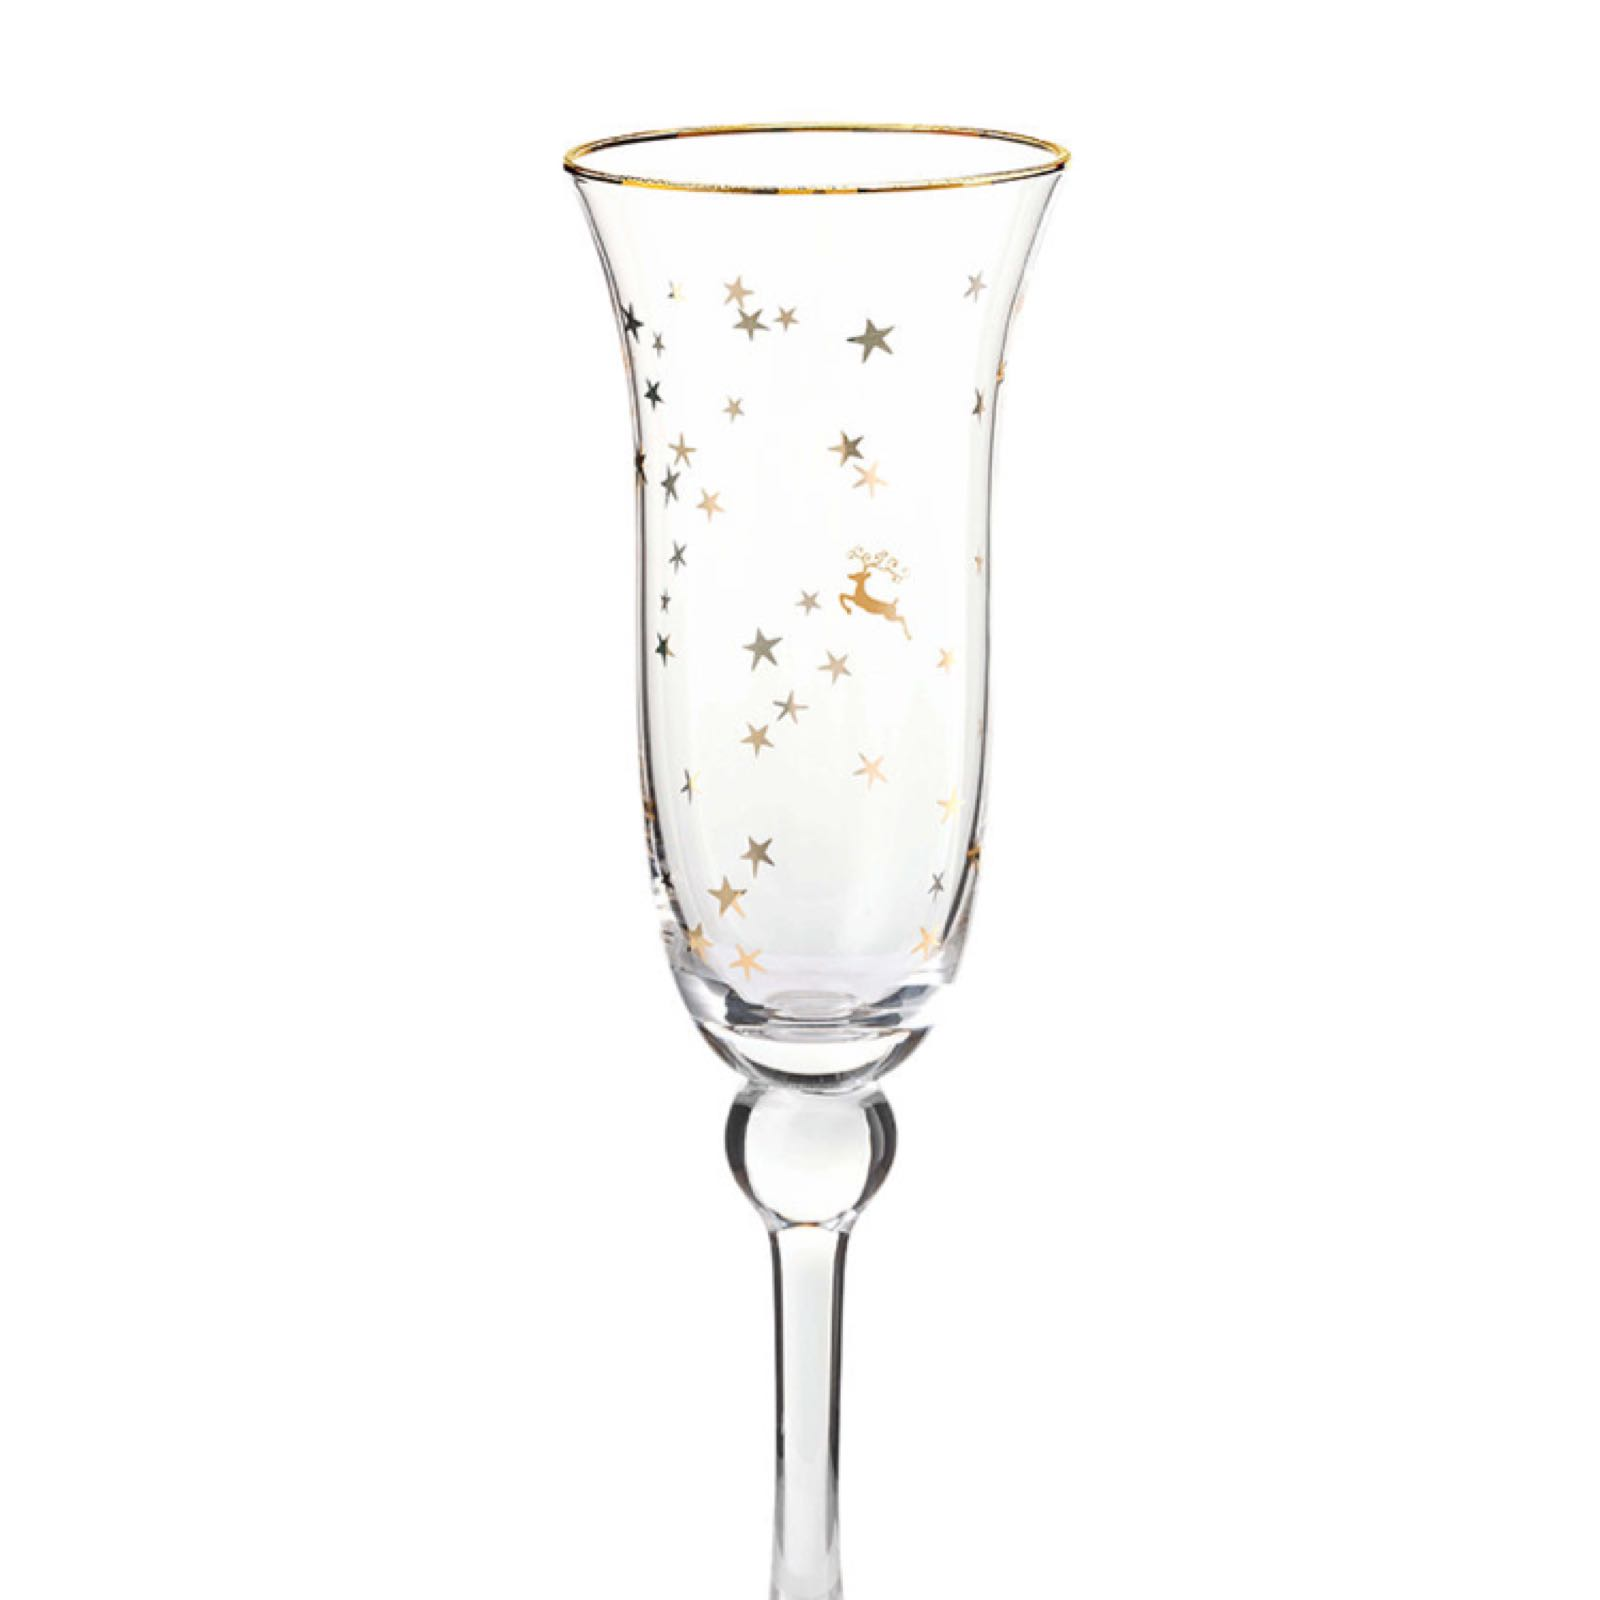 Pip studio Christmas Champagne Flute